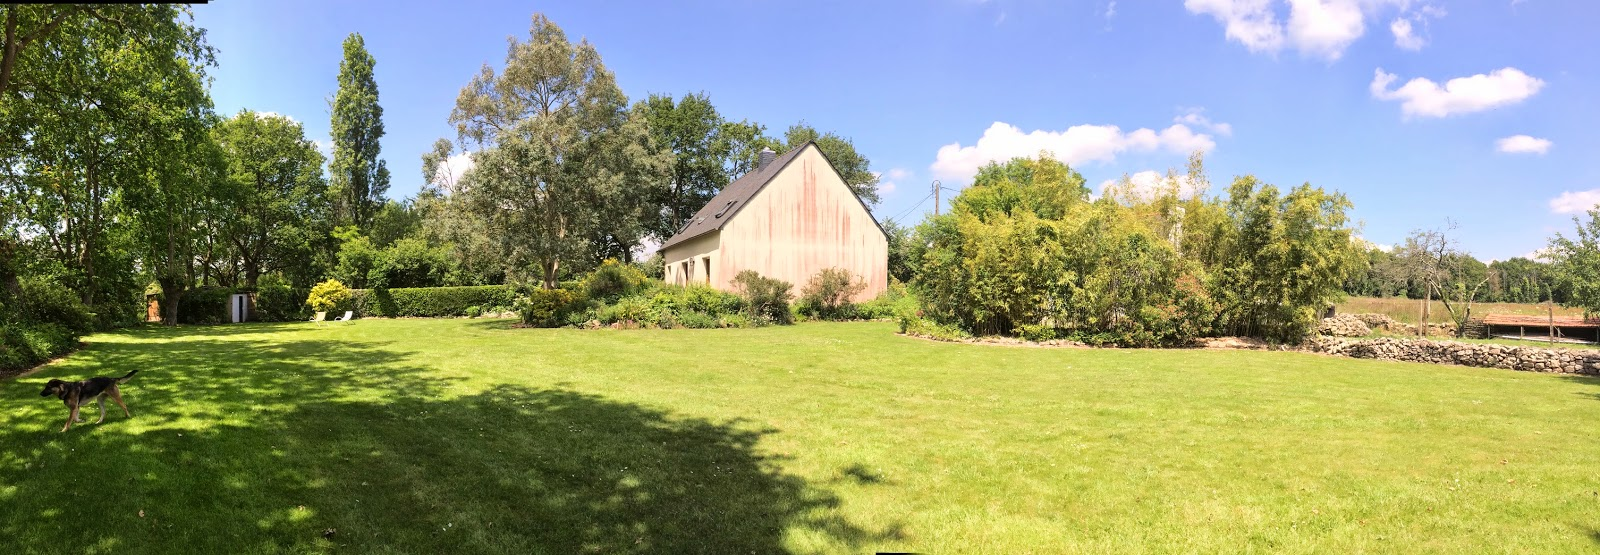 Gite kerjean locmariaquer 56 juillet 2014 for Entretien jardin quesnoy sur deule